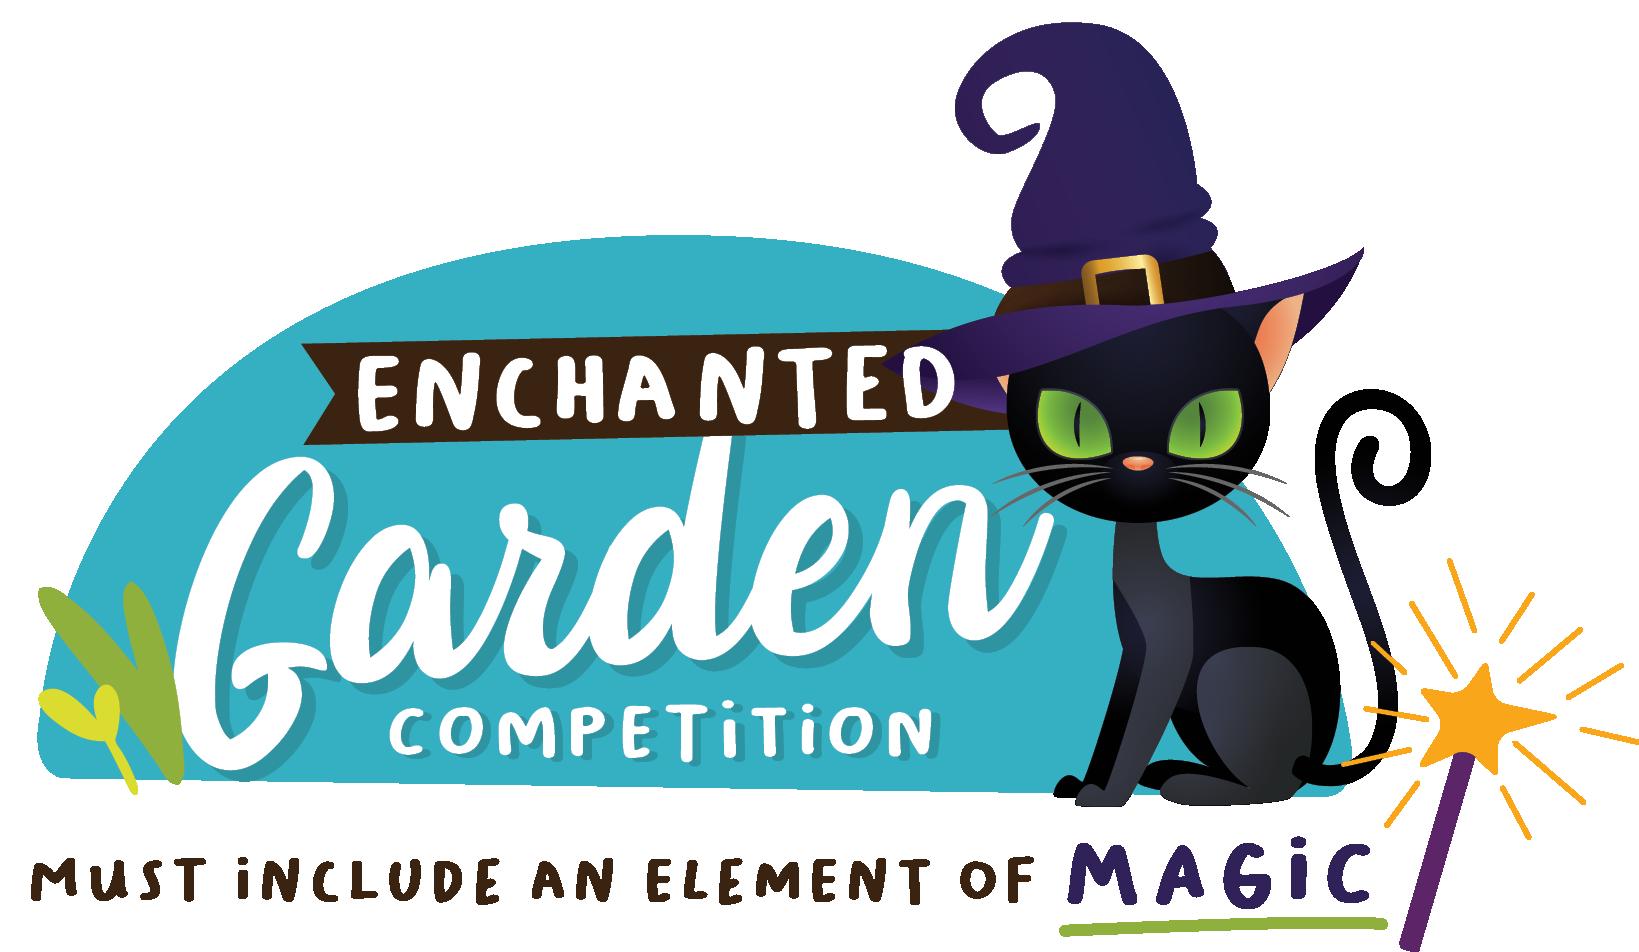 Enchanted Garden Competition